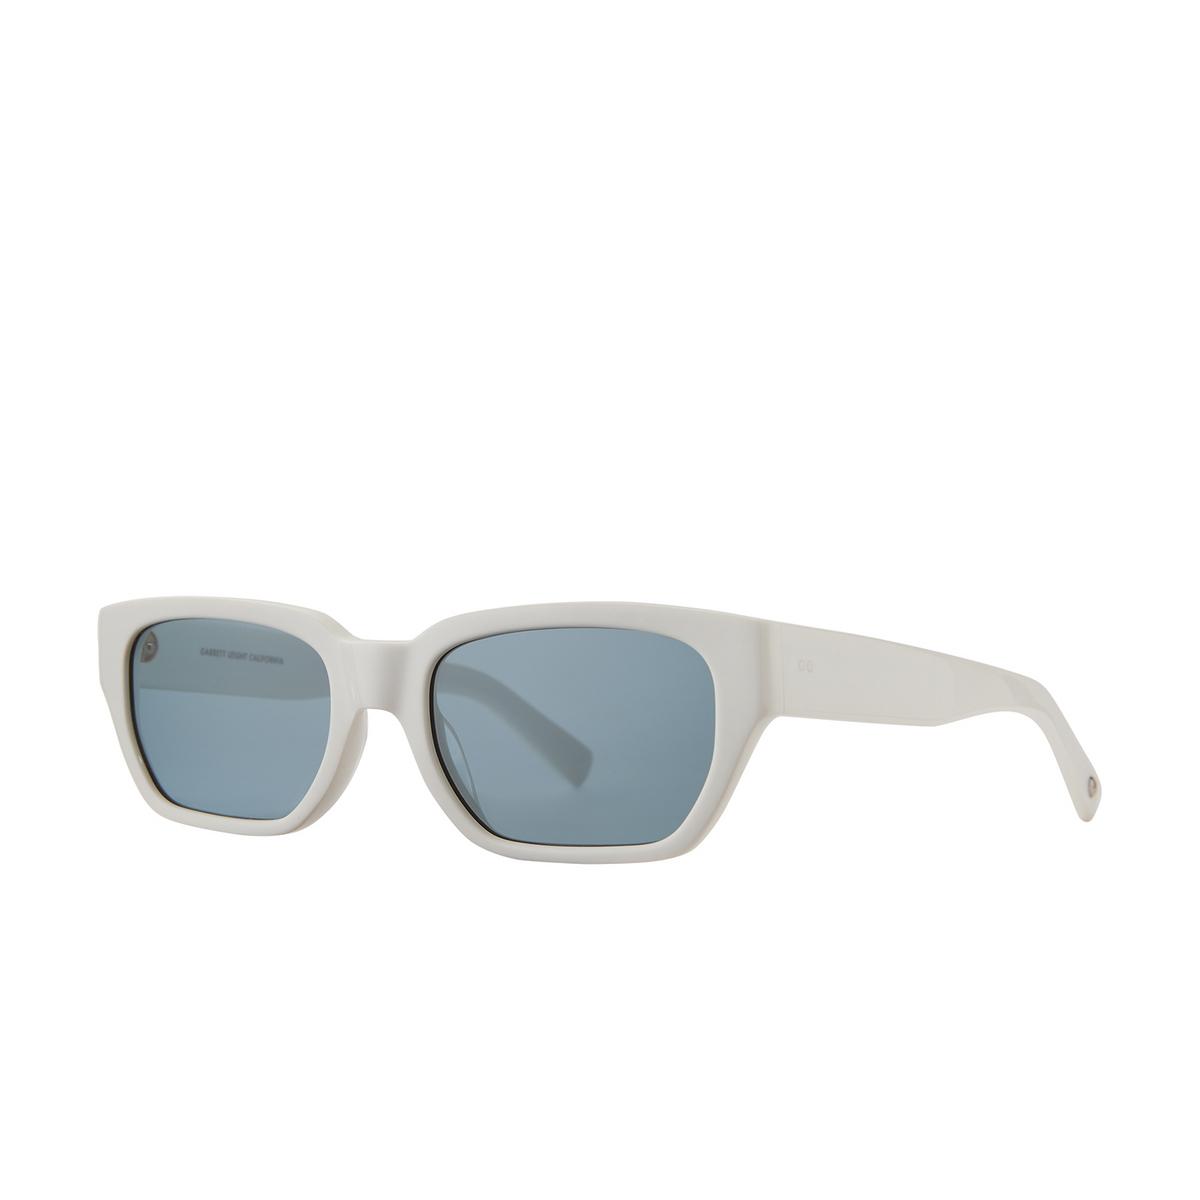 Garrett Leight® Rectangle Sunglasses: Mayan Sun color Teen Spirit Teespi/sfpac - three-quarters view.